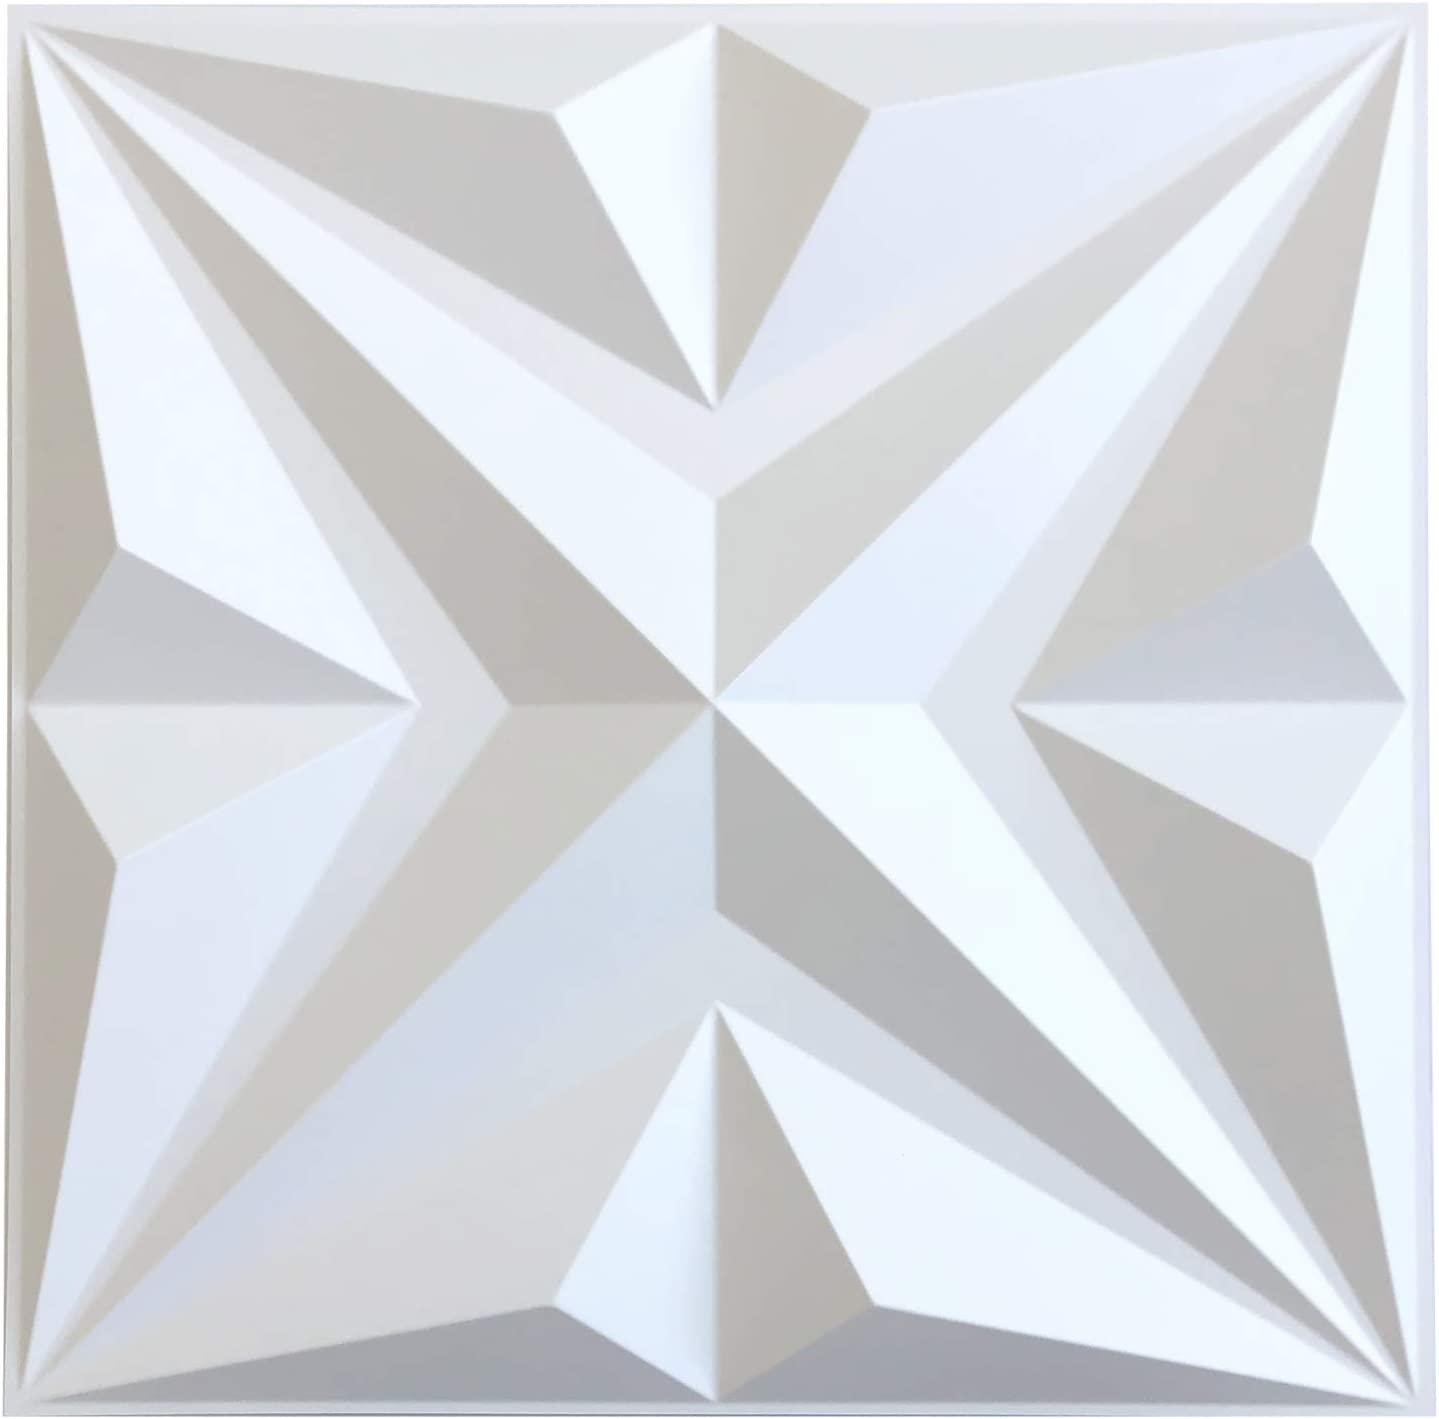 MIX3D PVC Wall Panels, 3D Wall Panels for Interior Wall Decor, Matt White Wall Decor PVC Panel, Star 3D Textured Wall Panels, Pack of 12 PVC Wall Tiles Each Box.